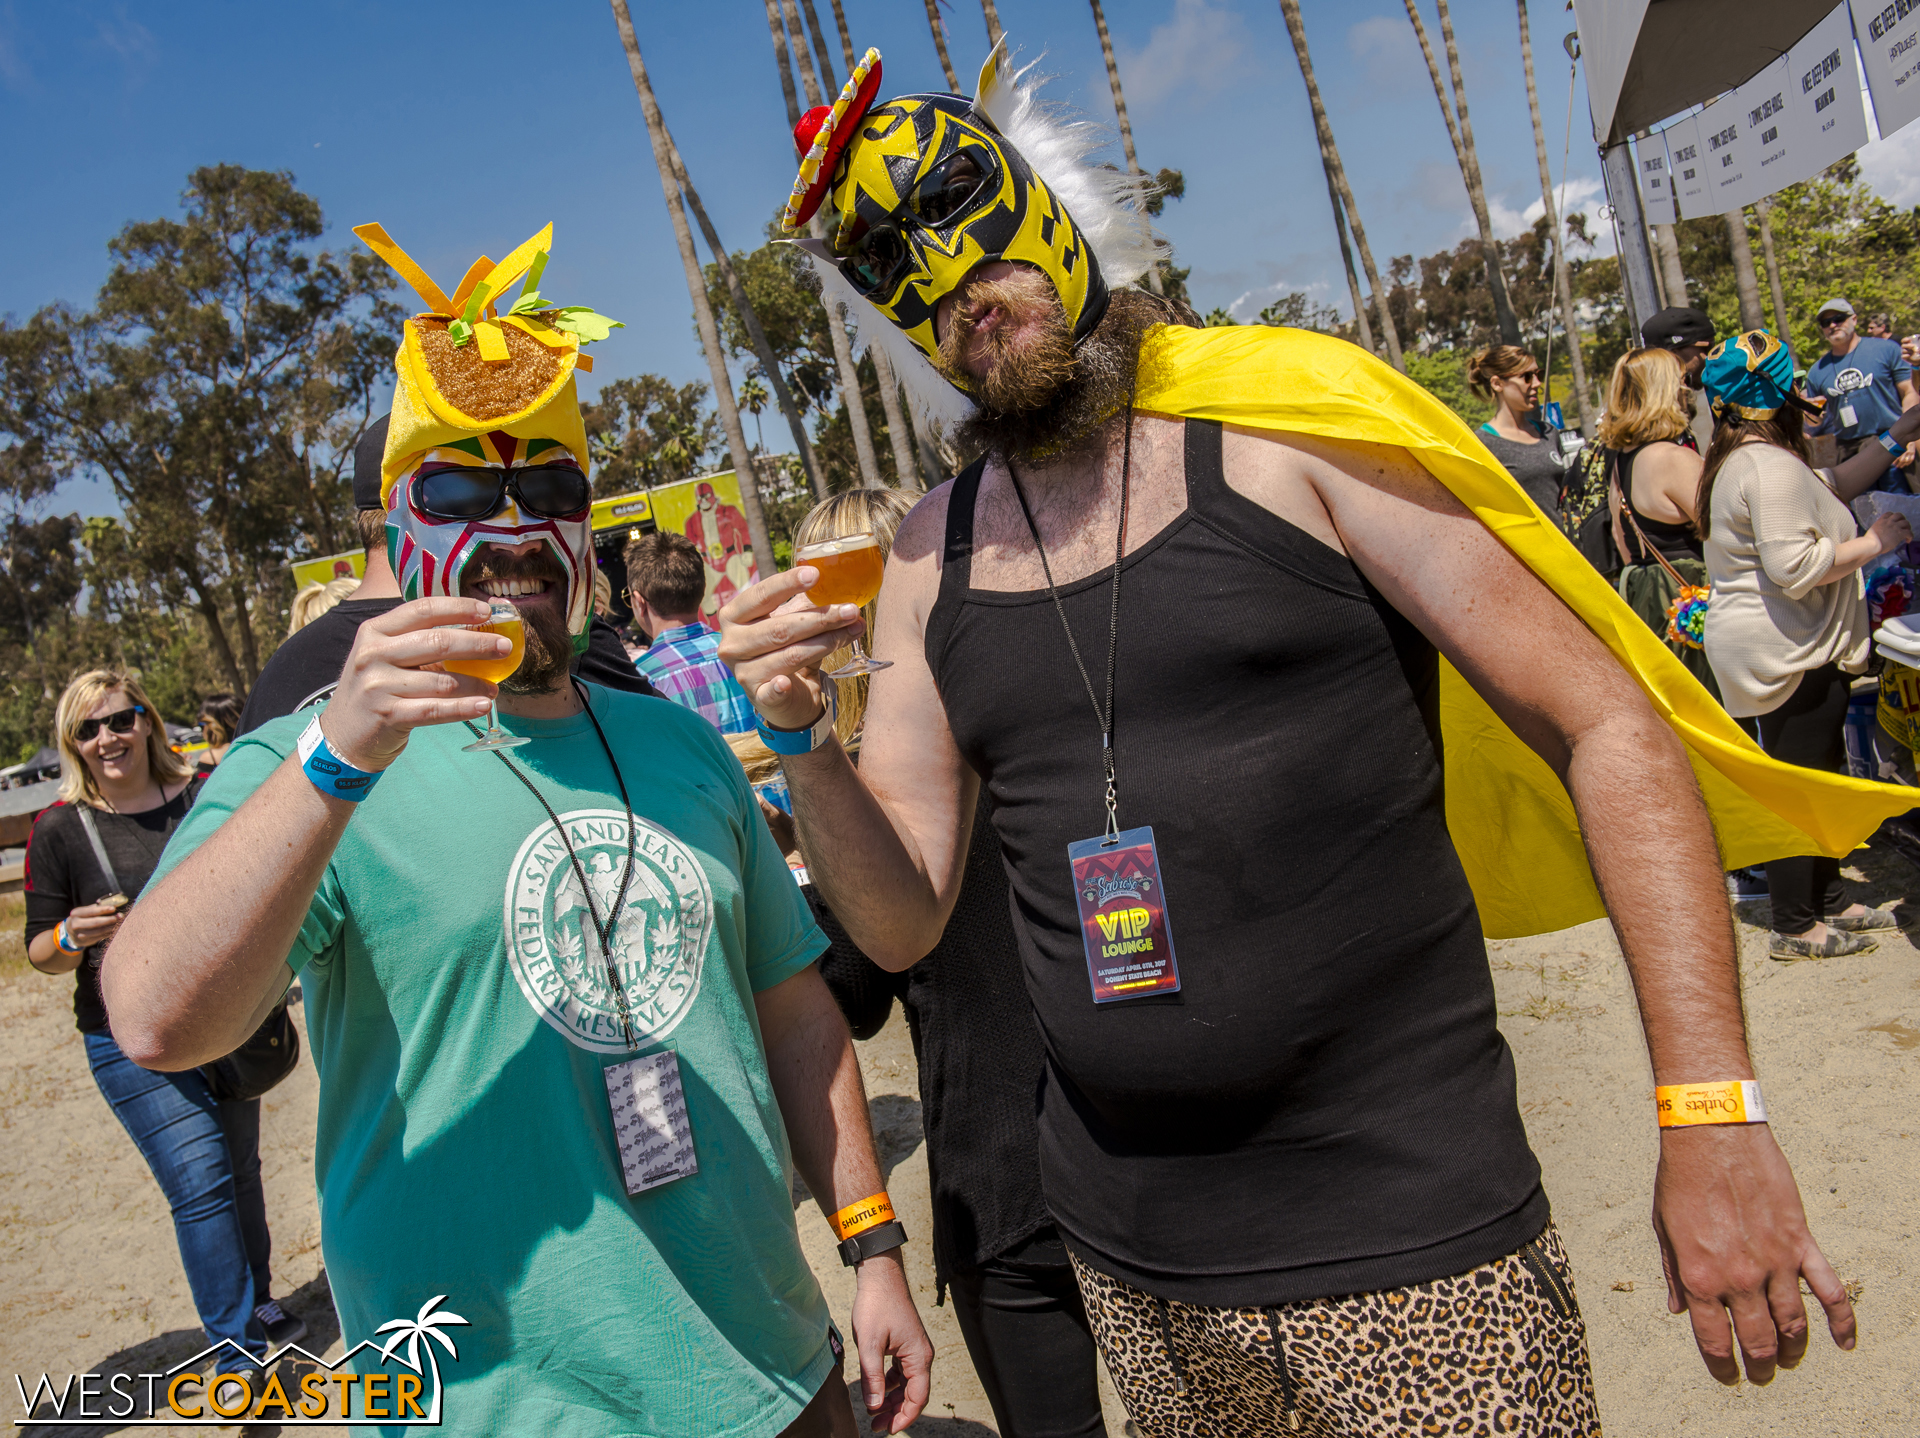 Fan luchadors were plenty around the festival.